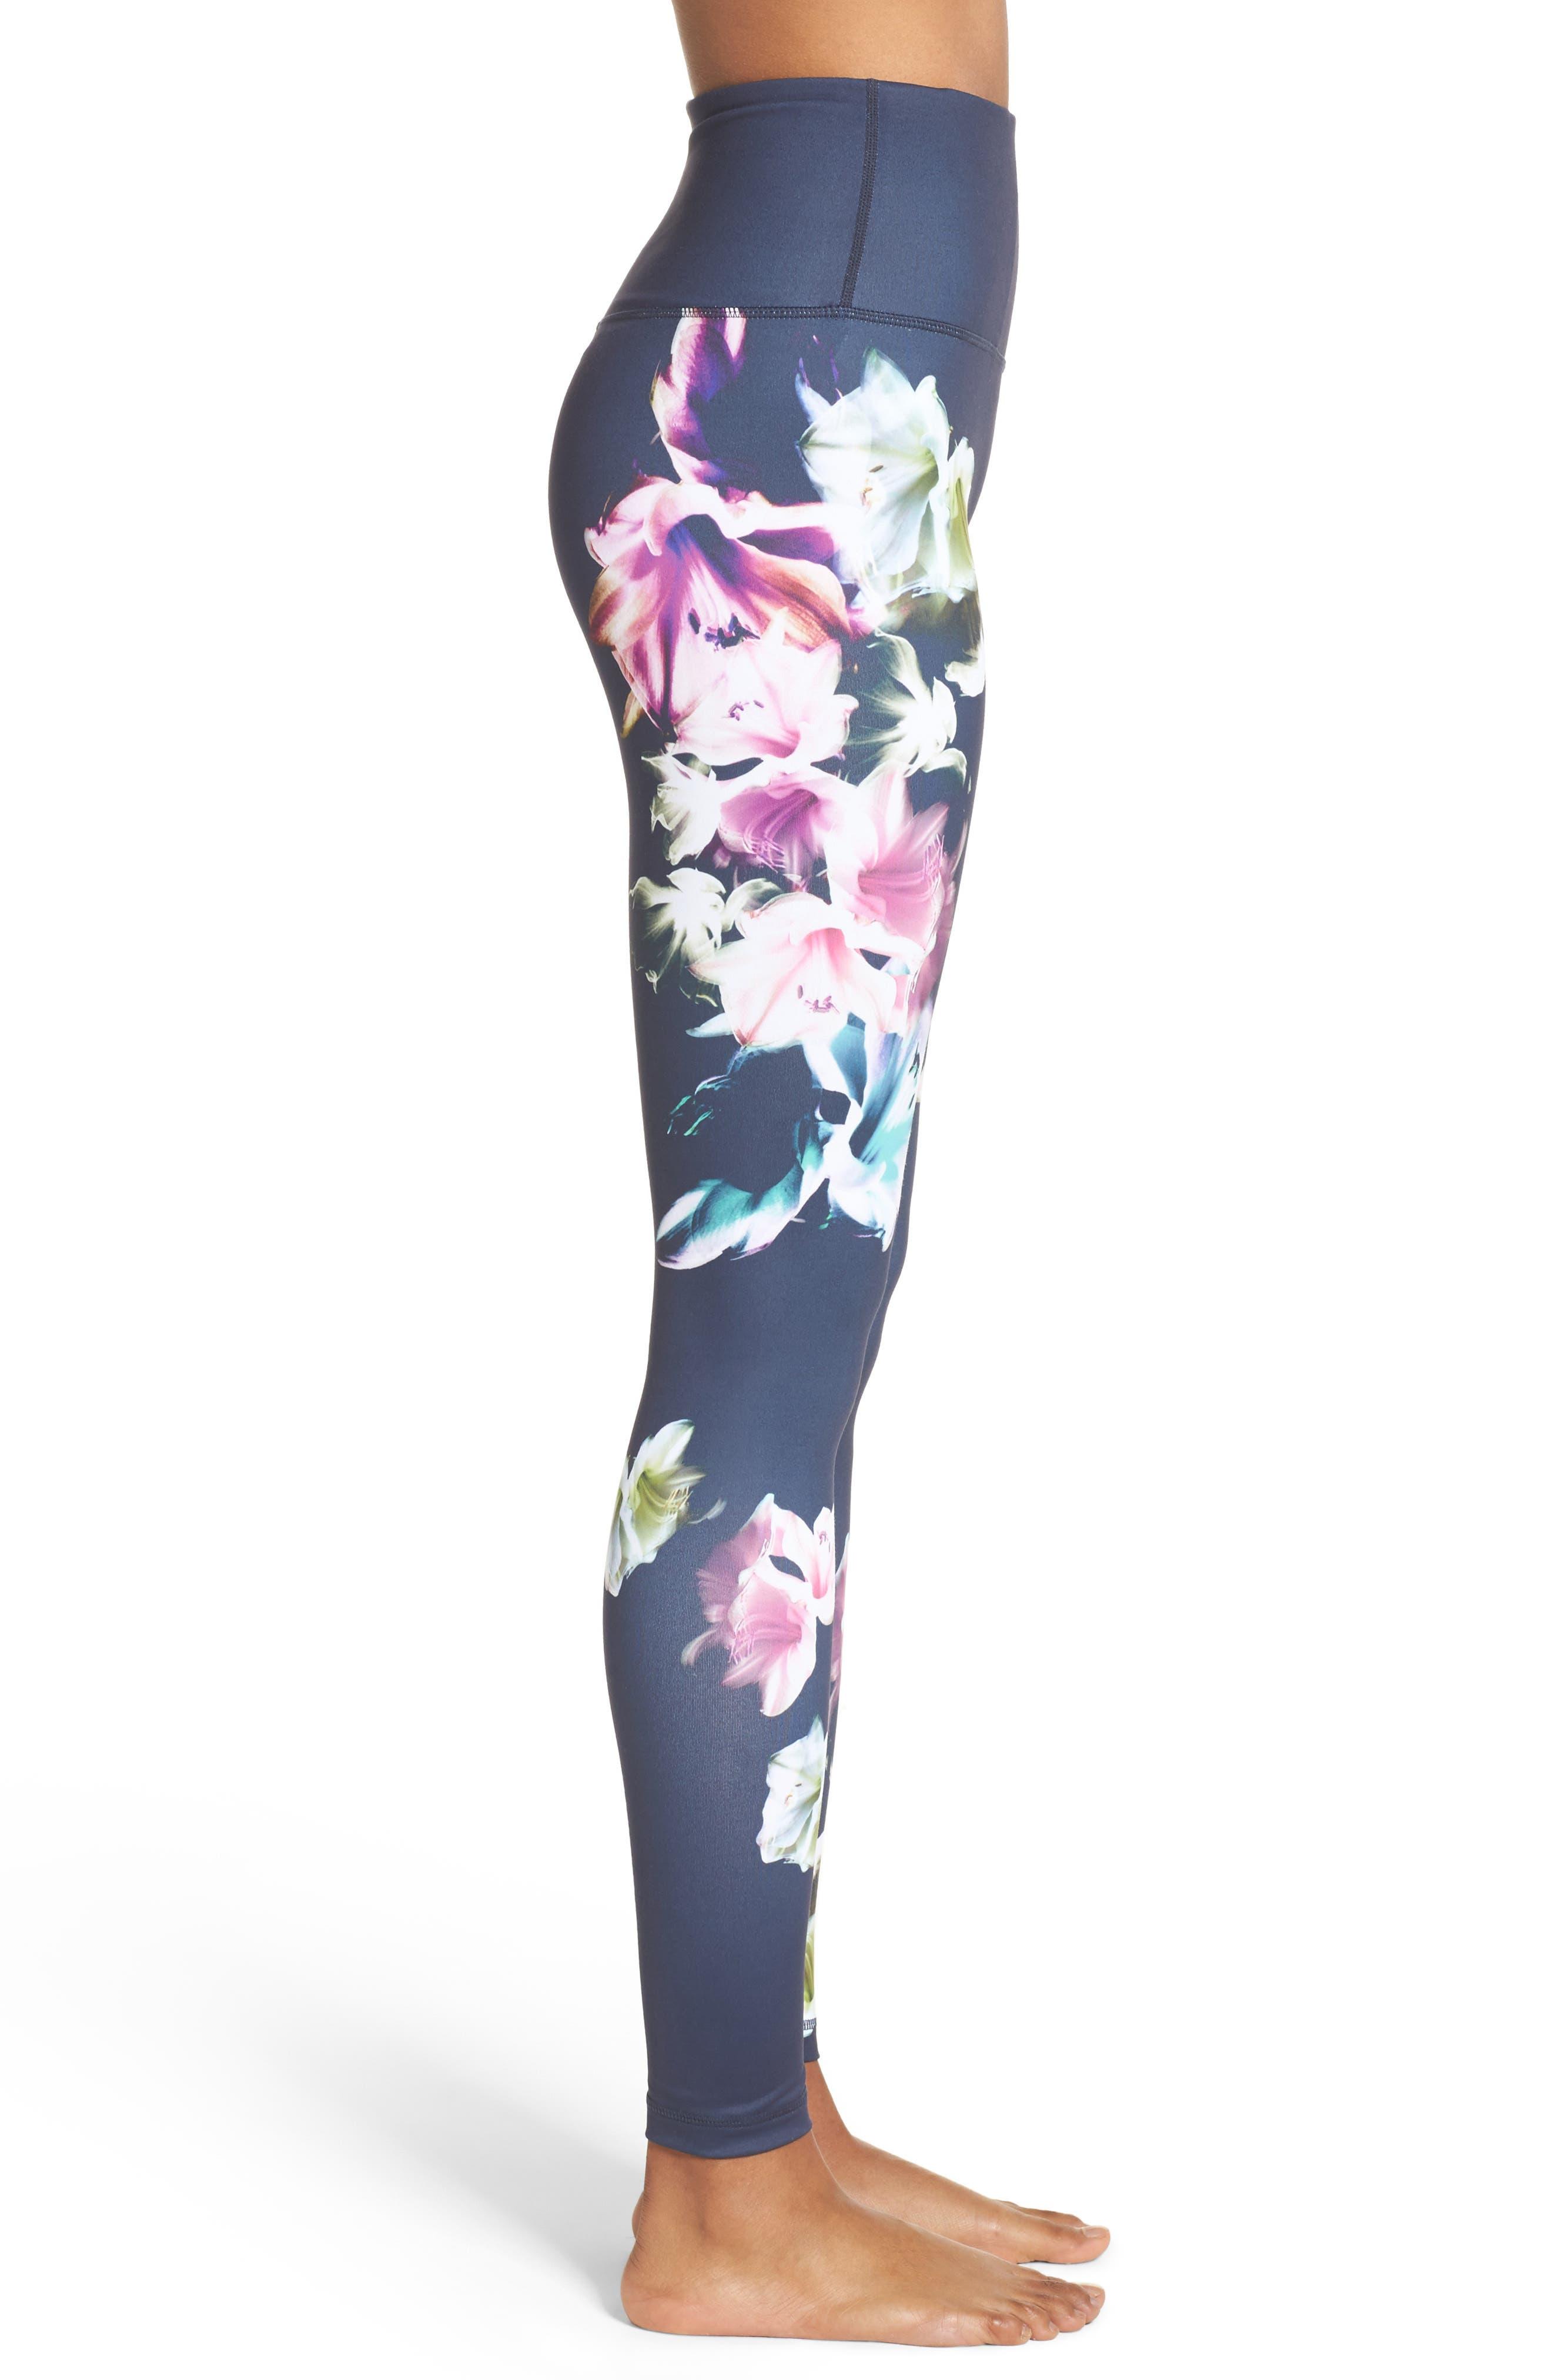 Pure Floral Ink High Waist Leggings,                             Alternate thumbnail 3, color,                             Grey Slate Floral Engineer Prt